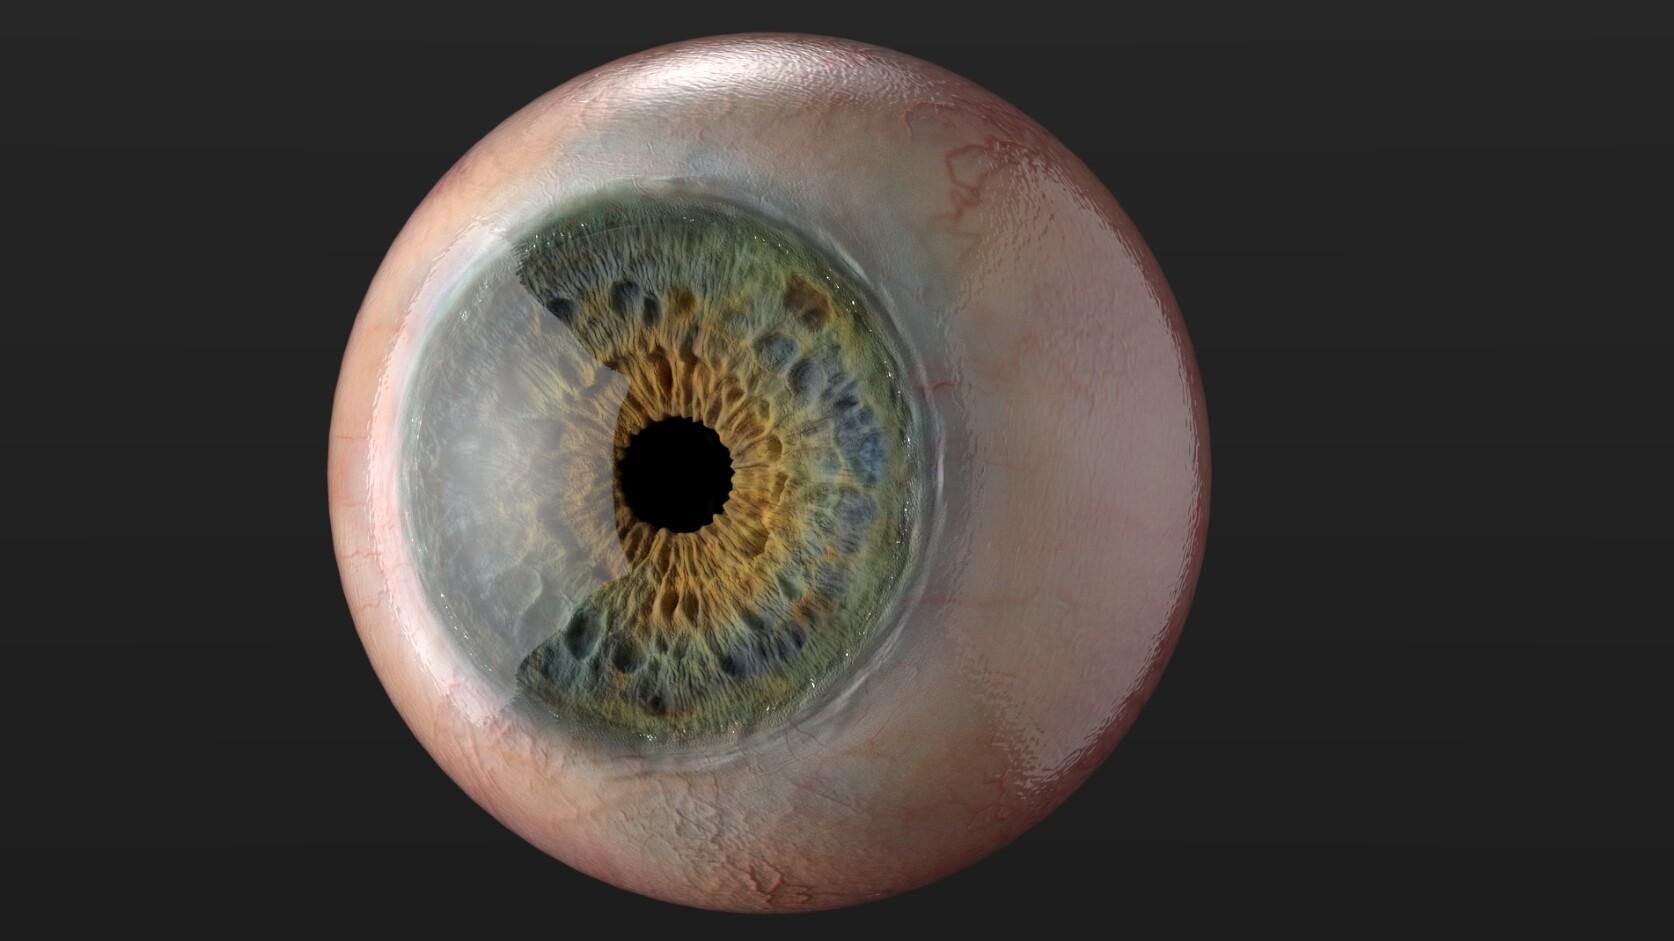 Chingiz jumagulov eye version10 002